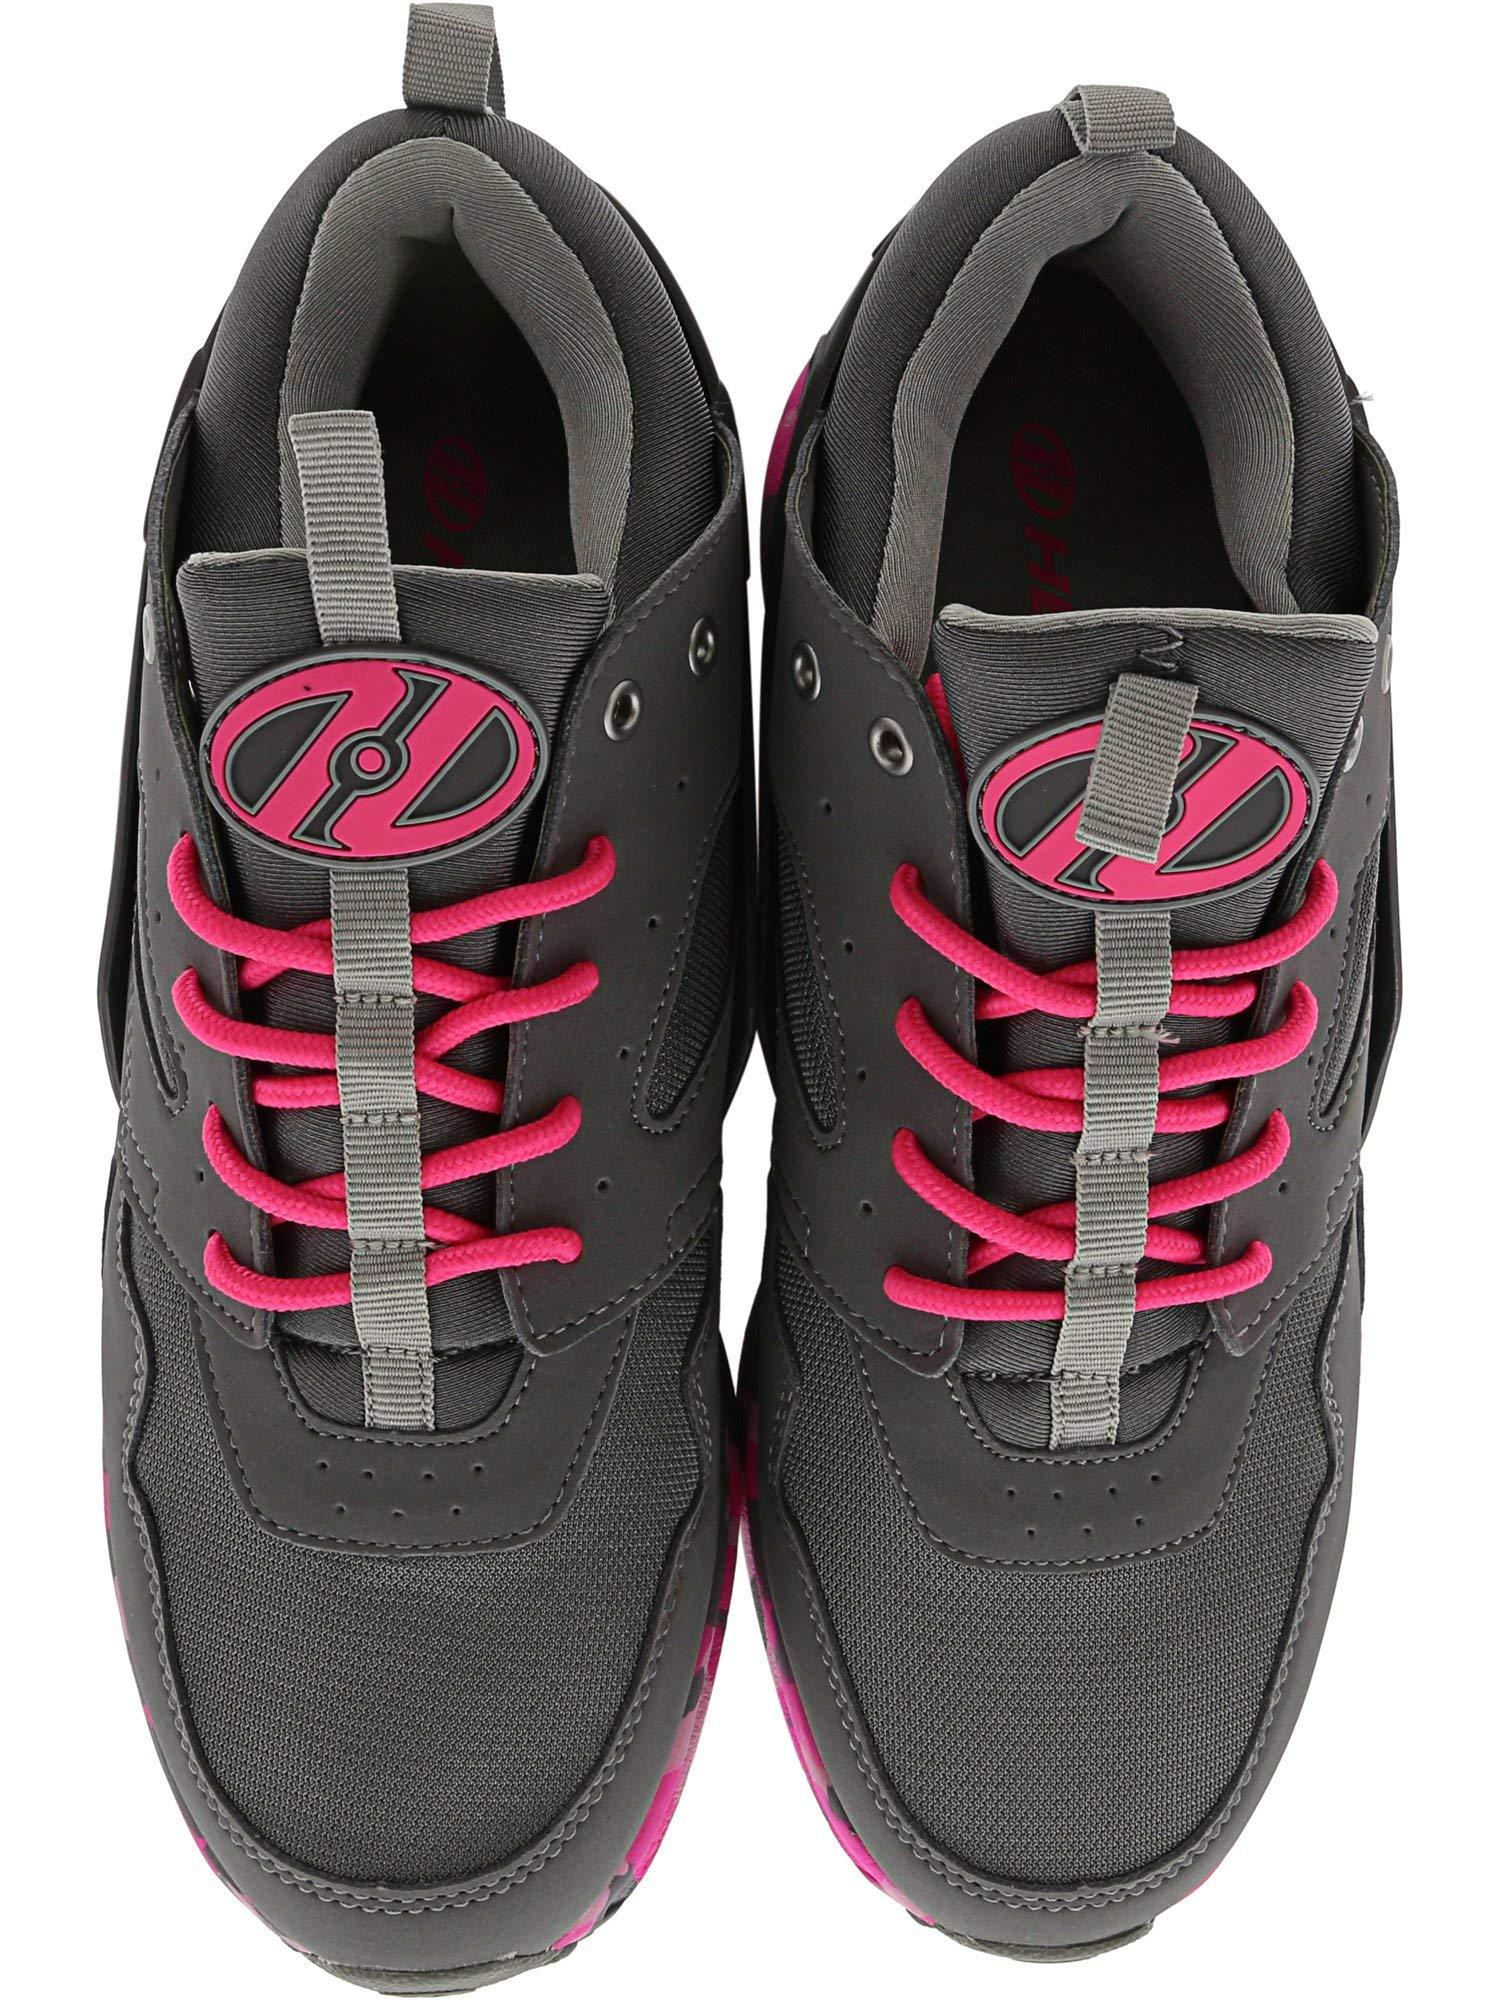 Heelys HE100098H Kid's Force Sneakers, Grey/Pink Confetti - 1 by Heelys (Image #3)